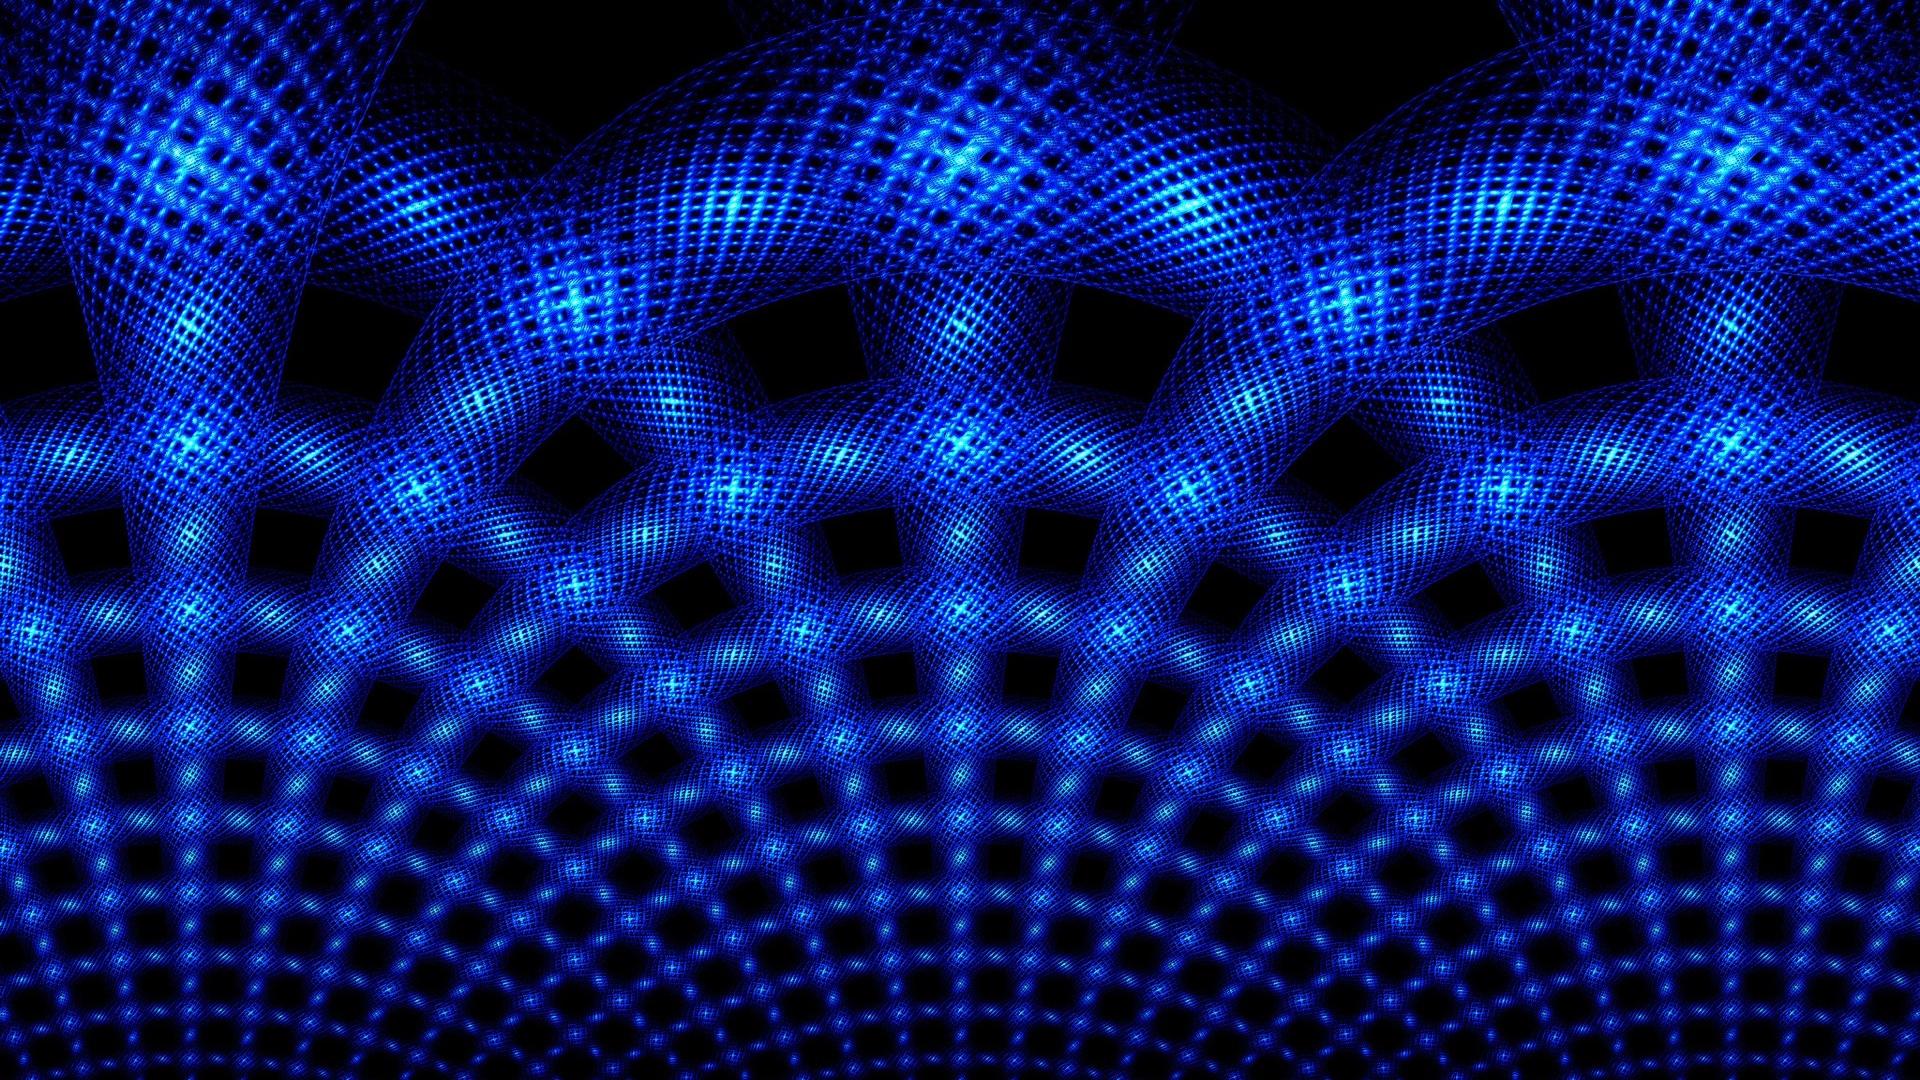 Download Wallpaper 1920x1080 Light Neon Mesh Shape Full Hd 1080p Hd Background